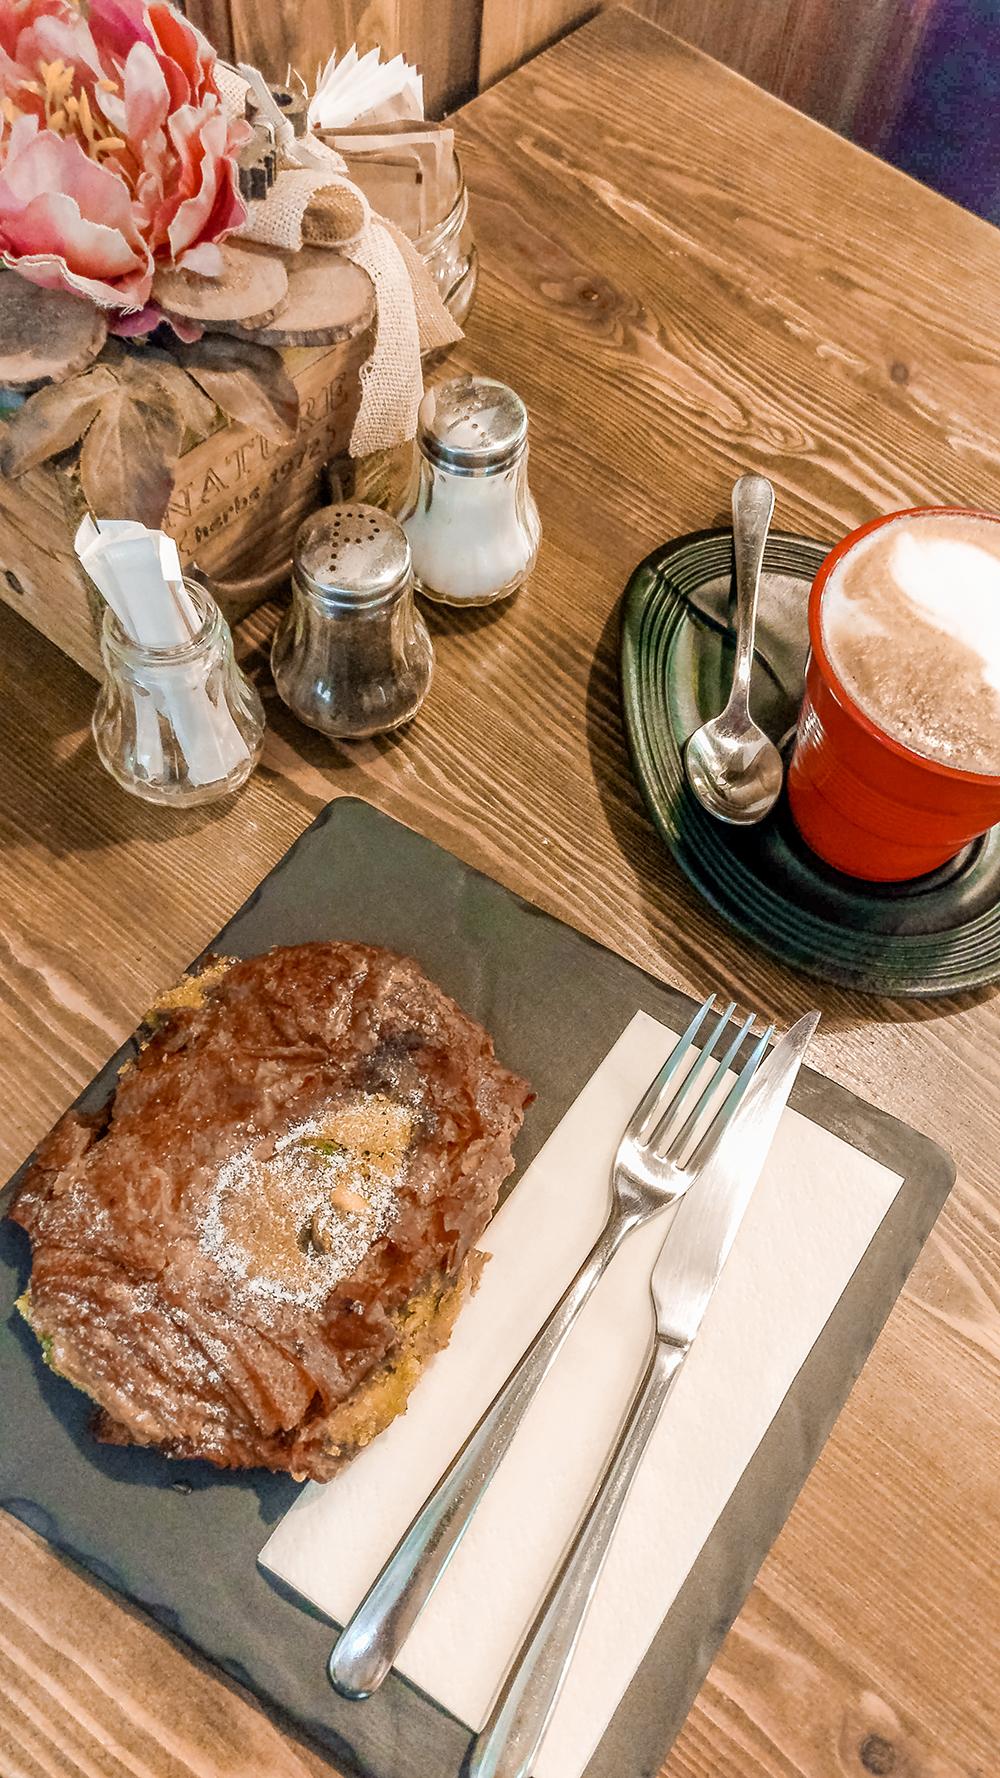 Pain aux chocolat pistache in Á table Madách Boulangerie - Pátisserie - Budapest's best breakfast & brunch places in the centre - Deák Ferenc square and Astoria | Aliz's Wonderland